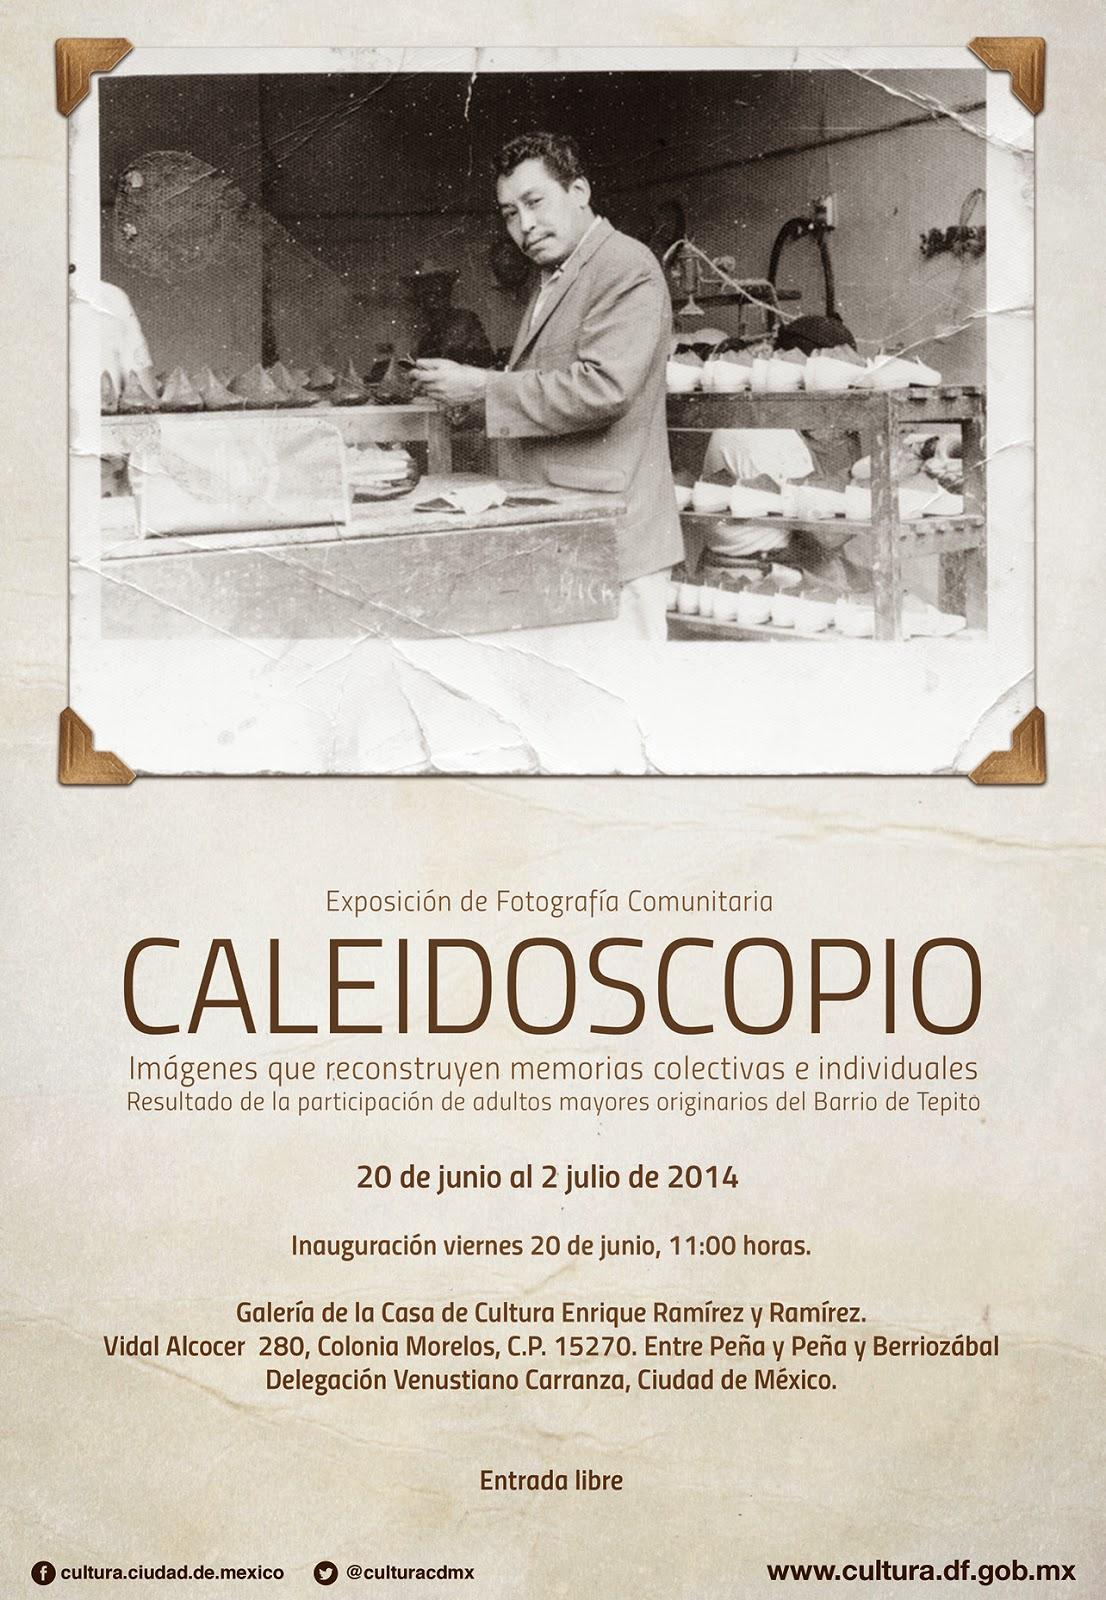 Exposición fotográfica comunitaria del Barrio de Tepito